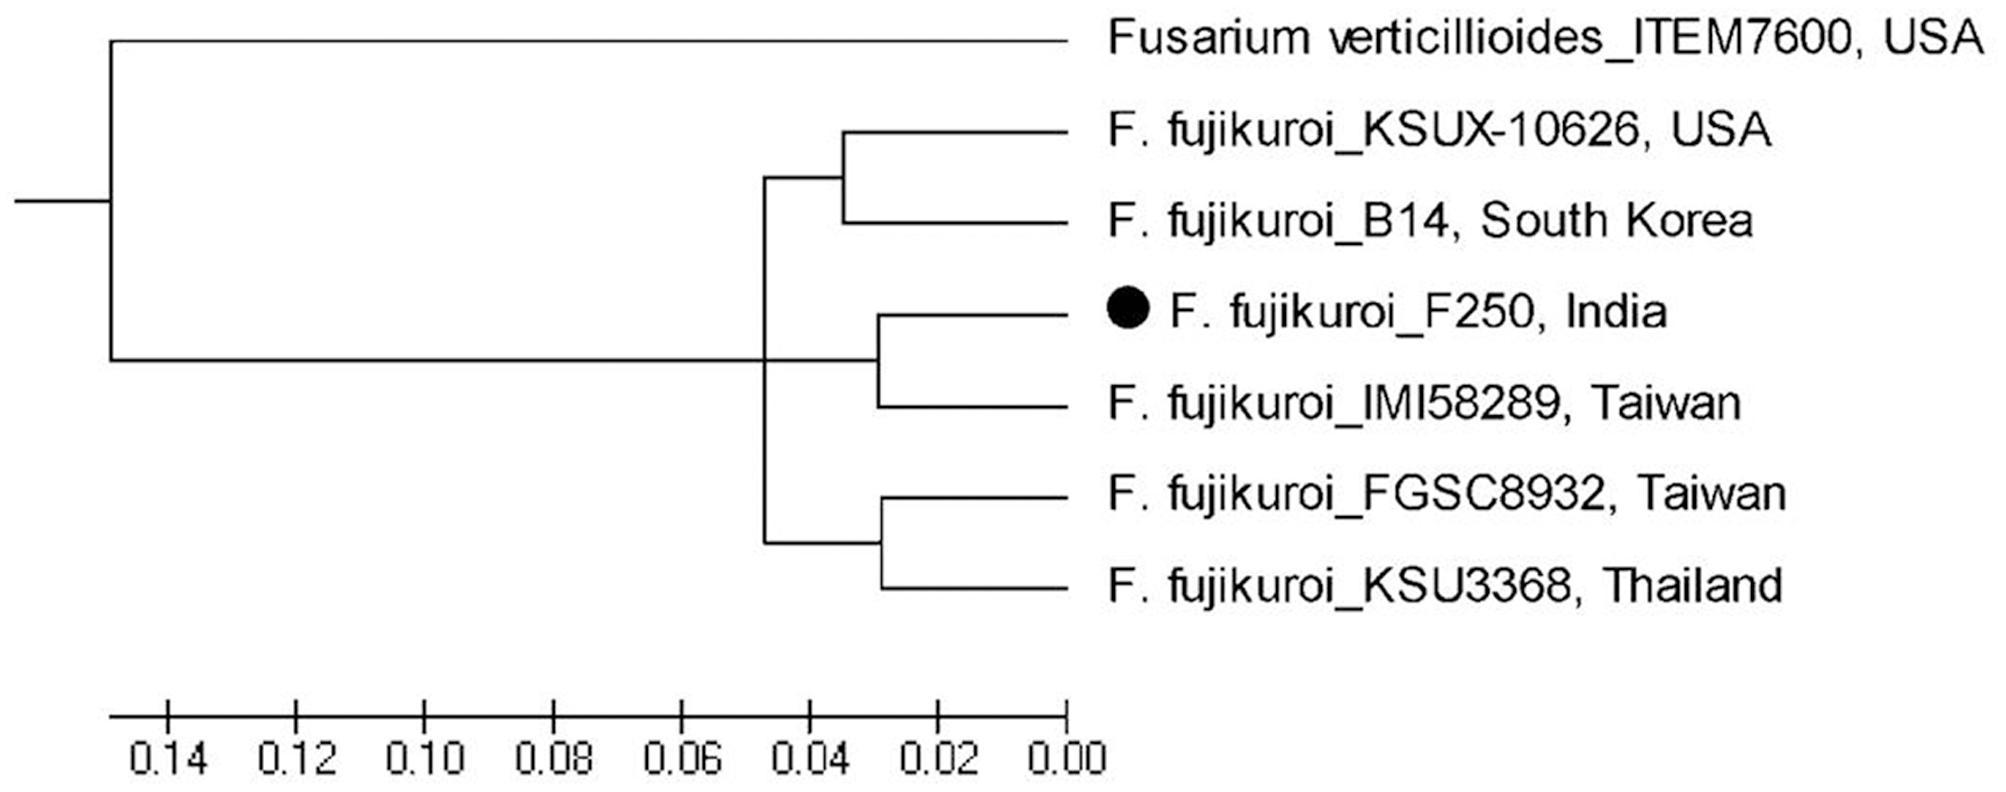 Frontiers Whole Genome Sequencing Of Fusarium Fujikuroi Provides Potato Gun Diagram